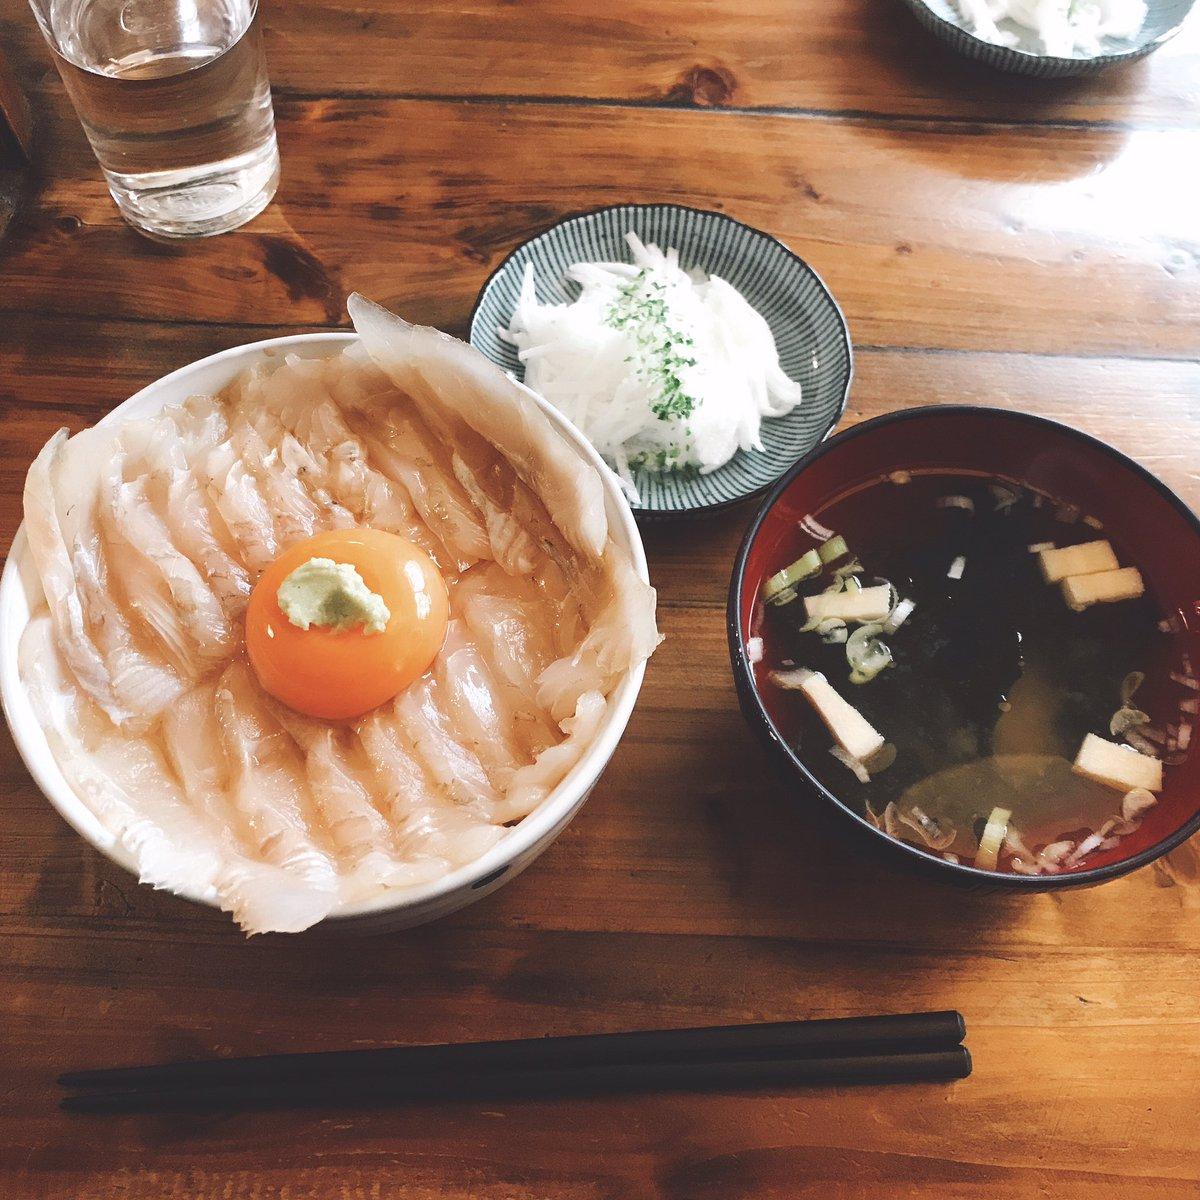 @bosyu_me 青森は八戸にある みなと食堂の平目丼 がオススメです!